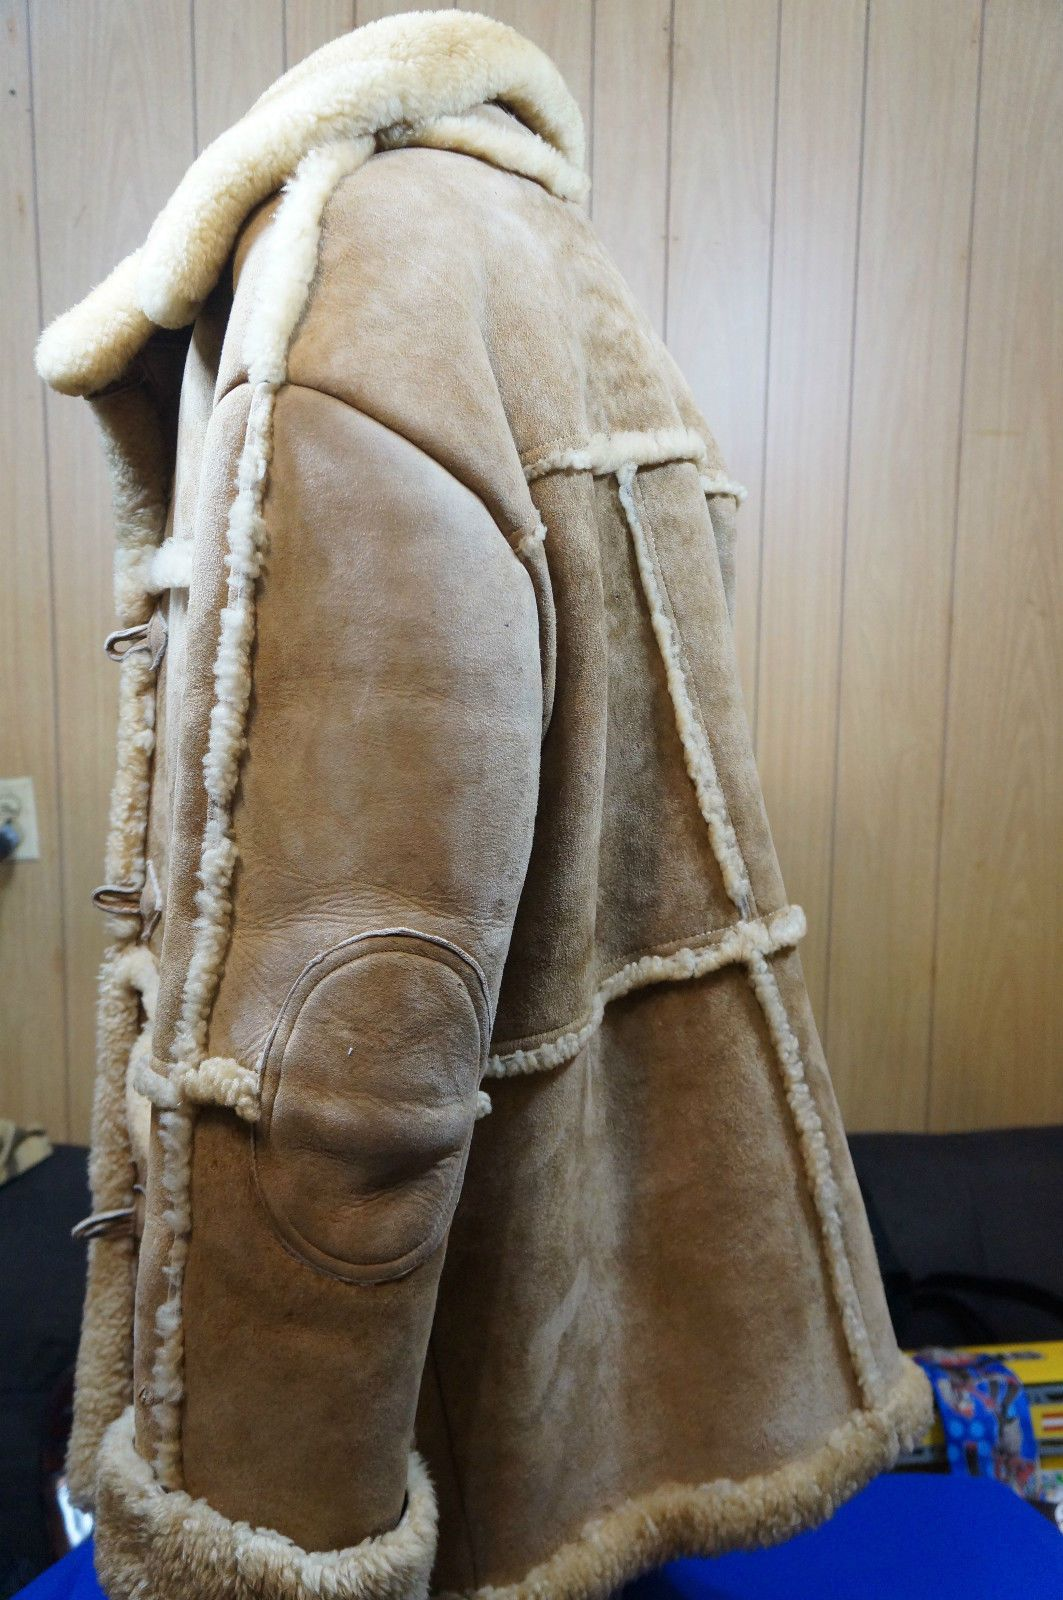 0a29f6fee0 Shearling Coat Vintage Rancher Marlboro Man Plush Sheepskin Overland Size  42